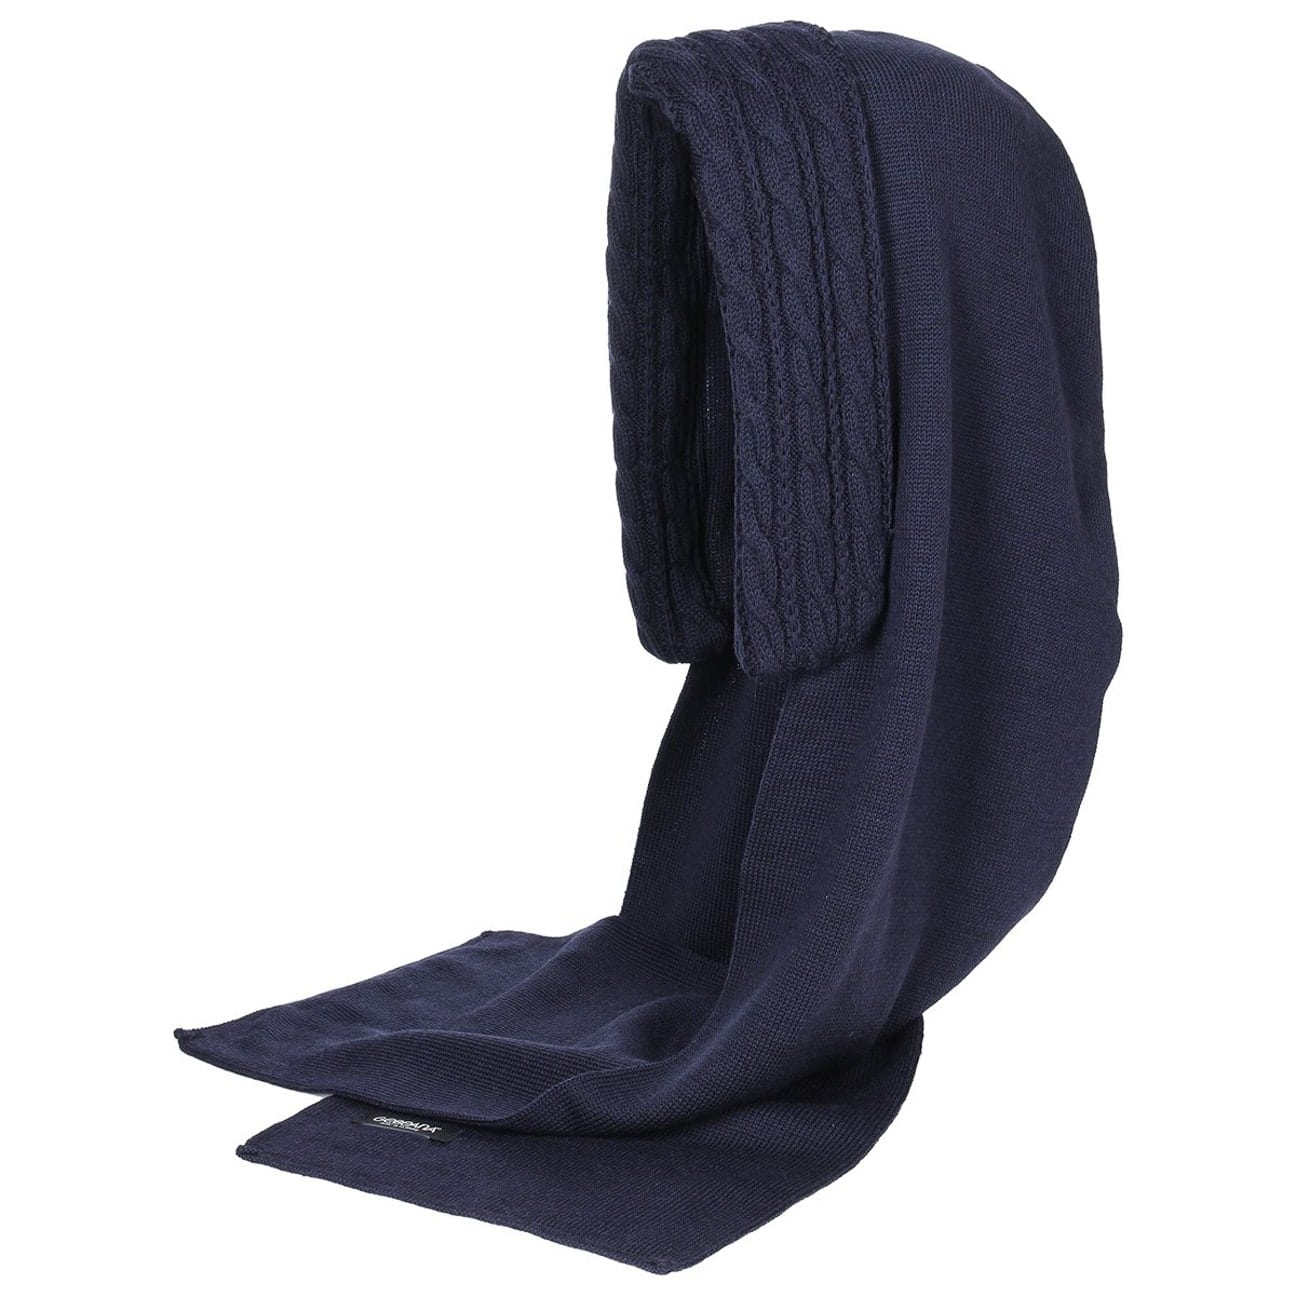 Bufanda con Gorro Cable Knit by Gebeana